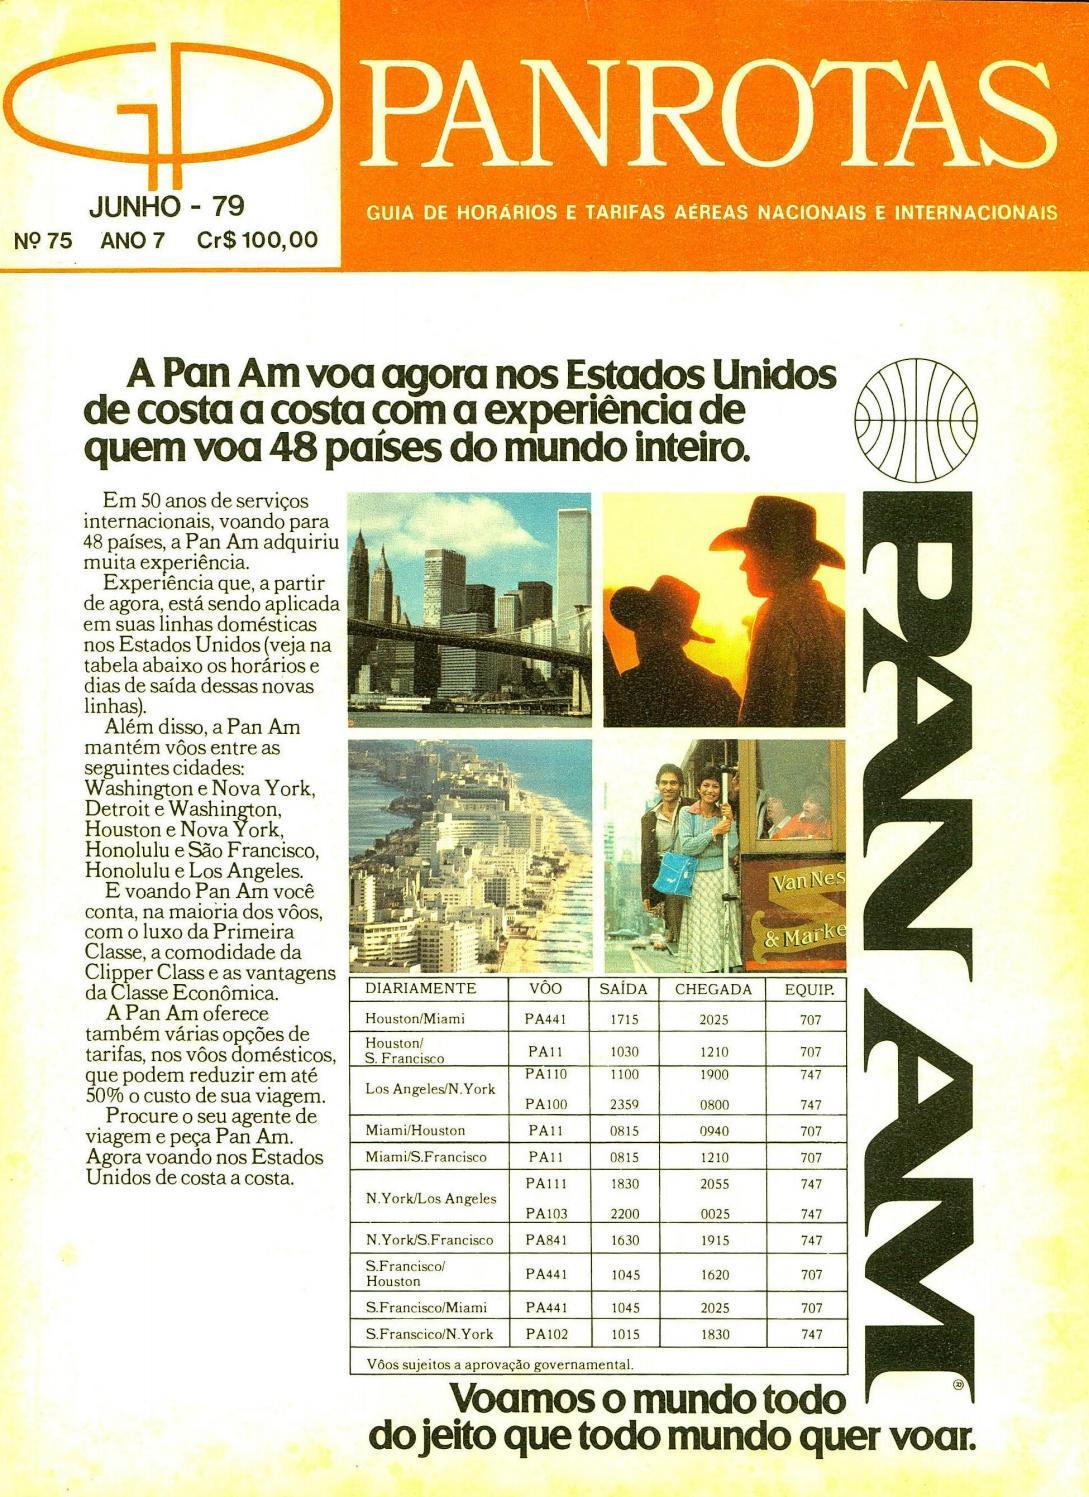 Guia PANROTAS   Edição 10   Junho/10 by PANROTAS Editora   issuu